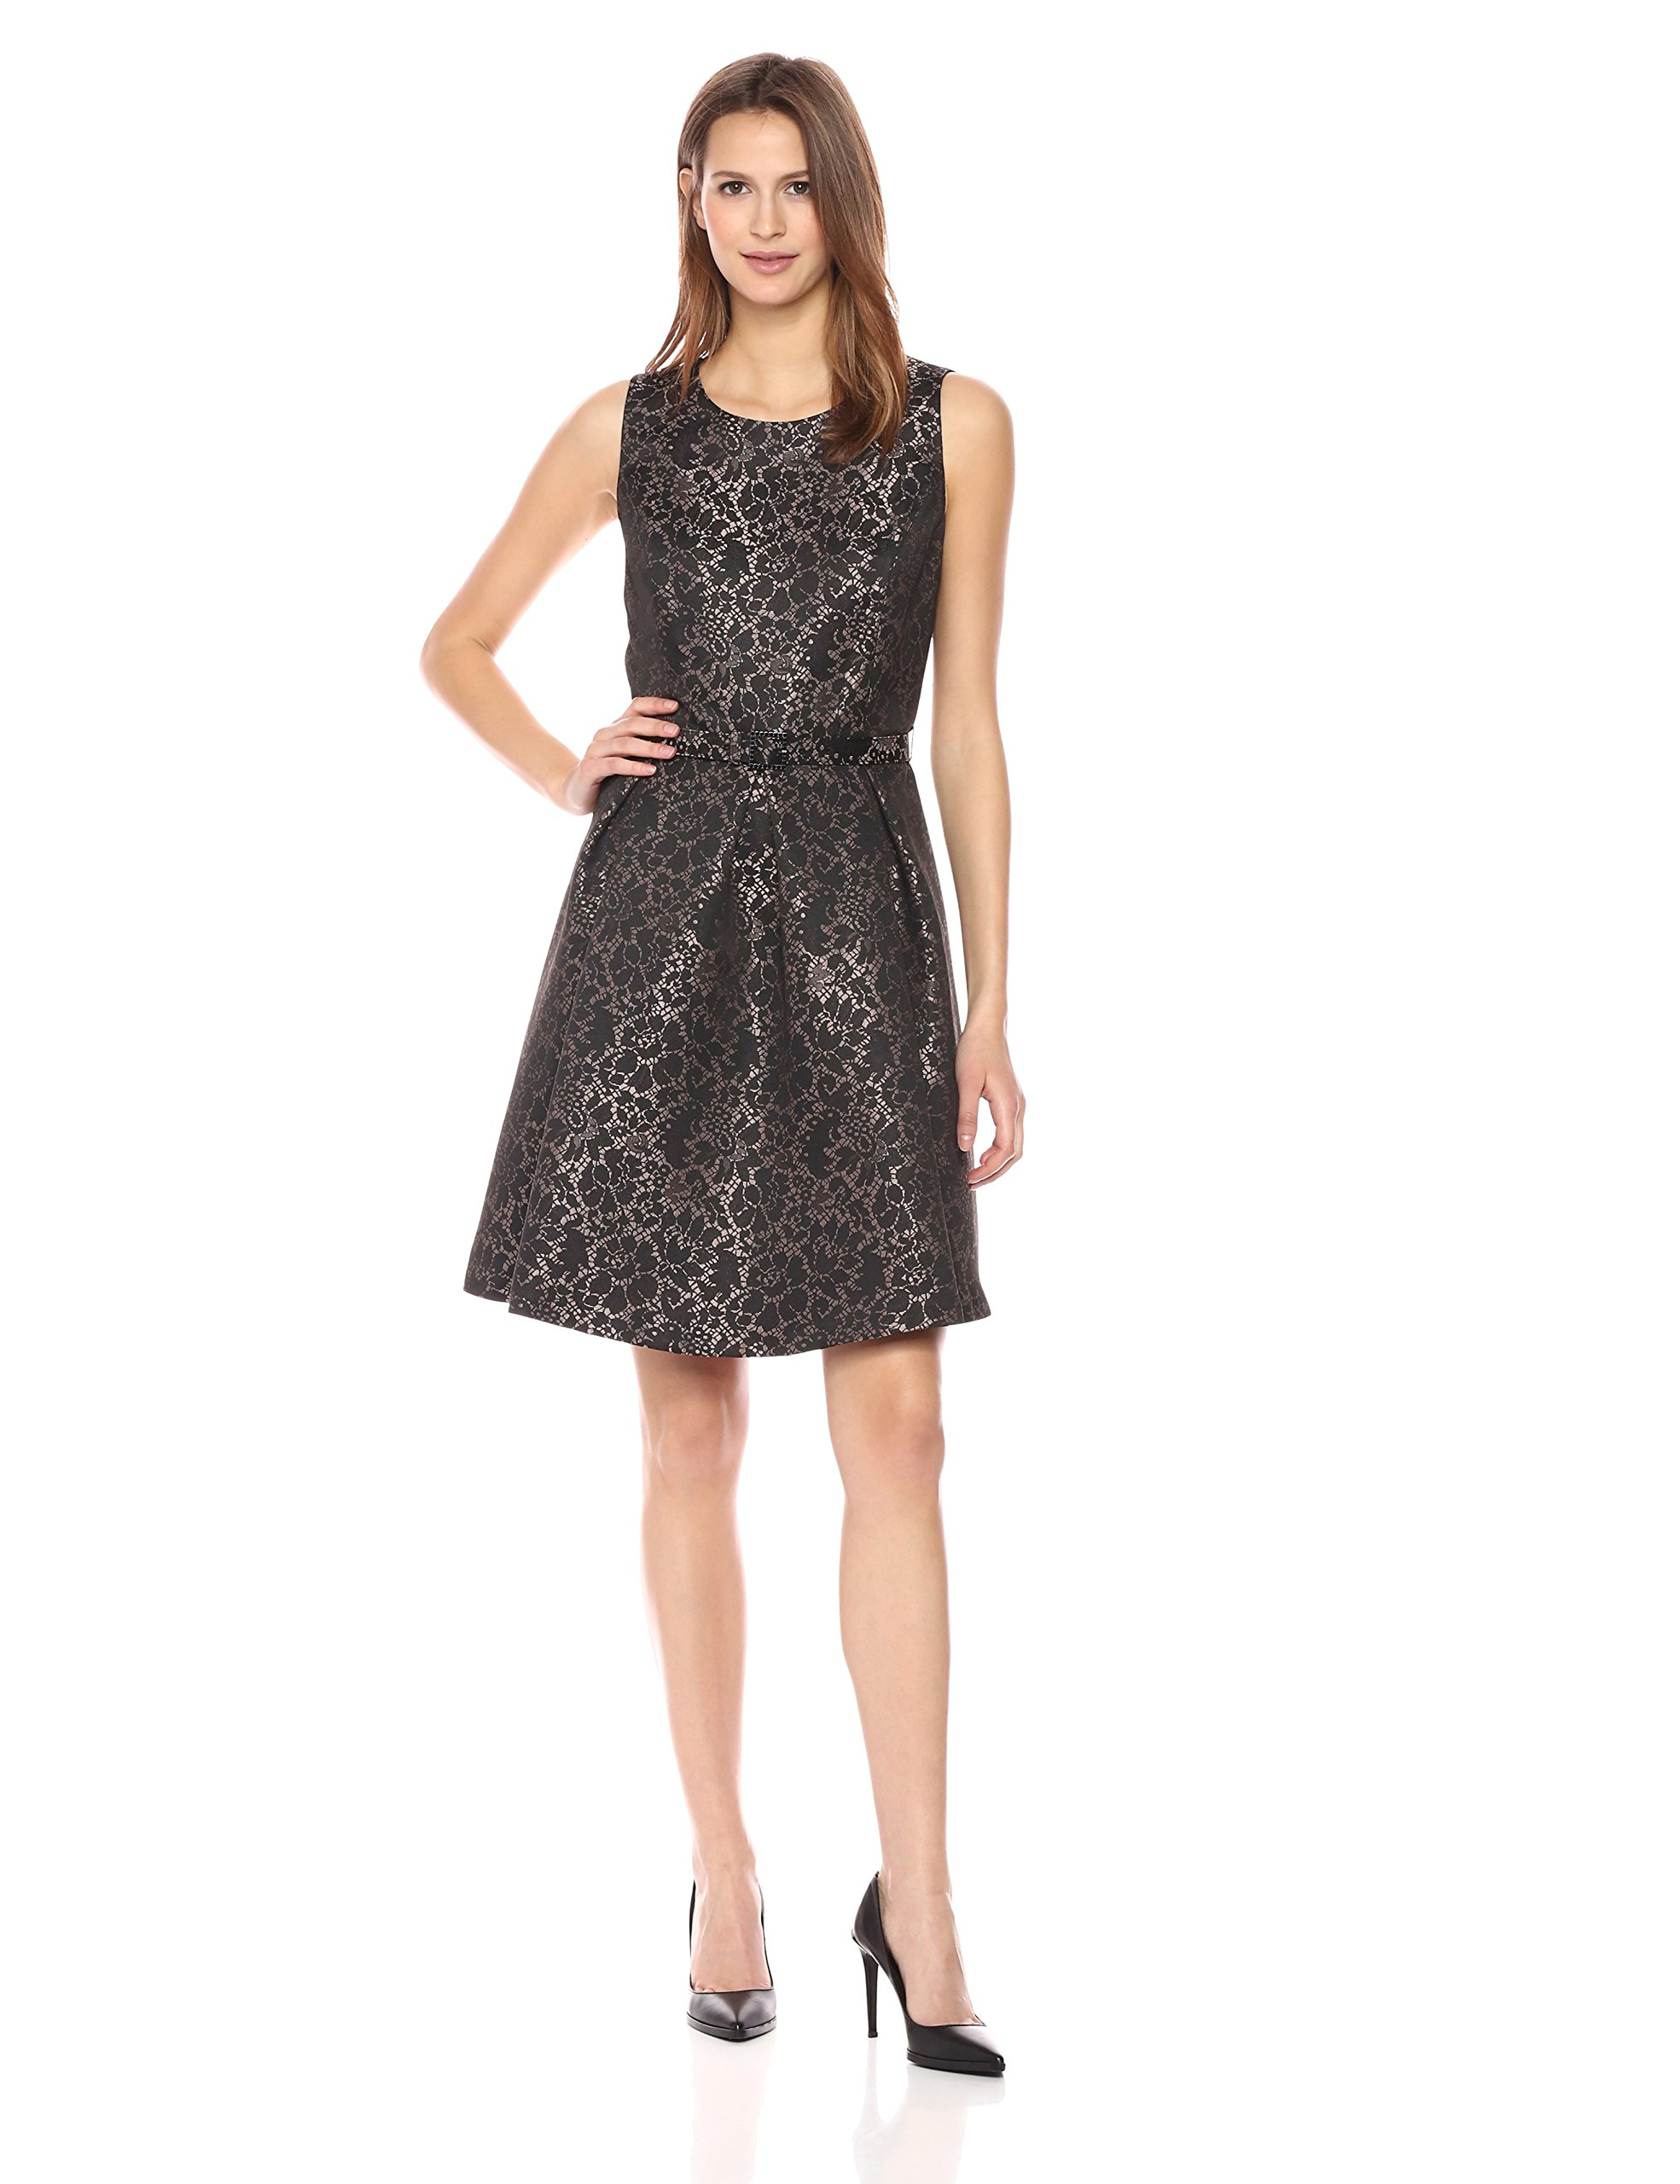 Nine West Women's Princess Seam Dress W Pleat Flare Skirt and Belt, Black/Cameo Multi, 8